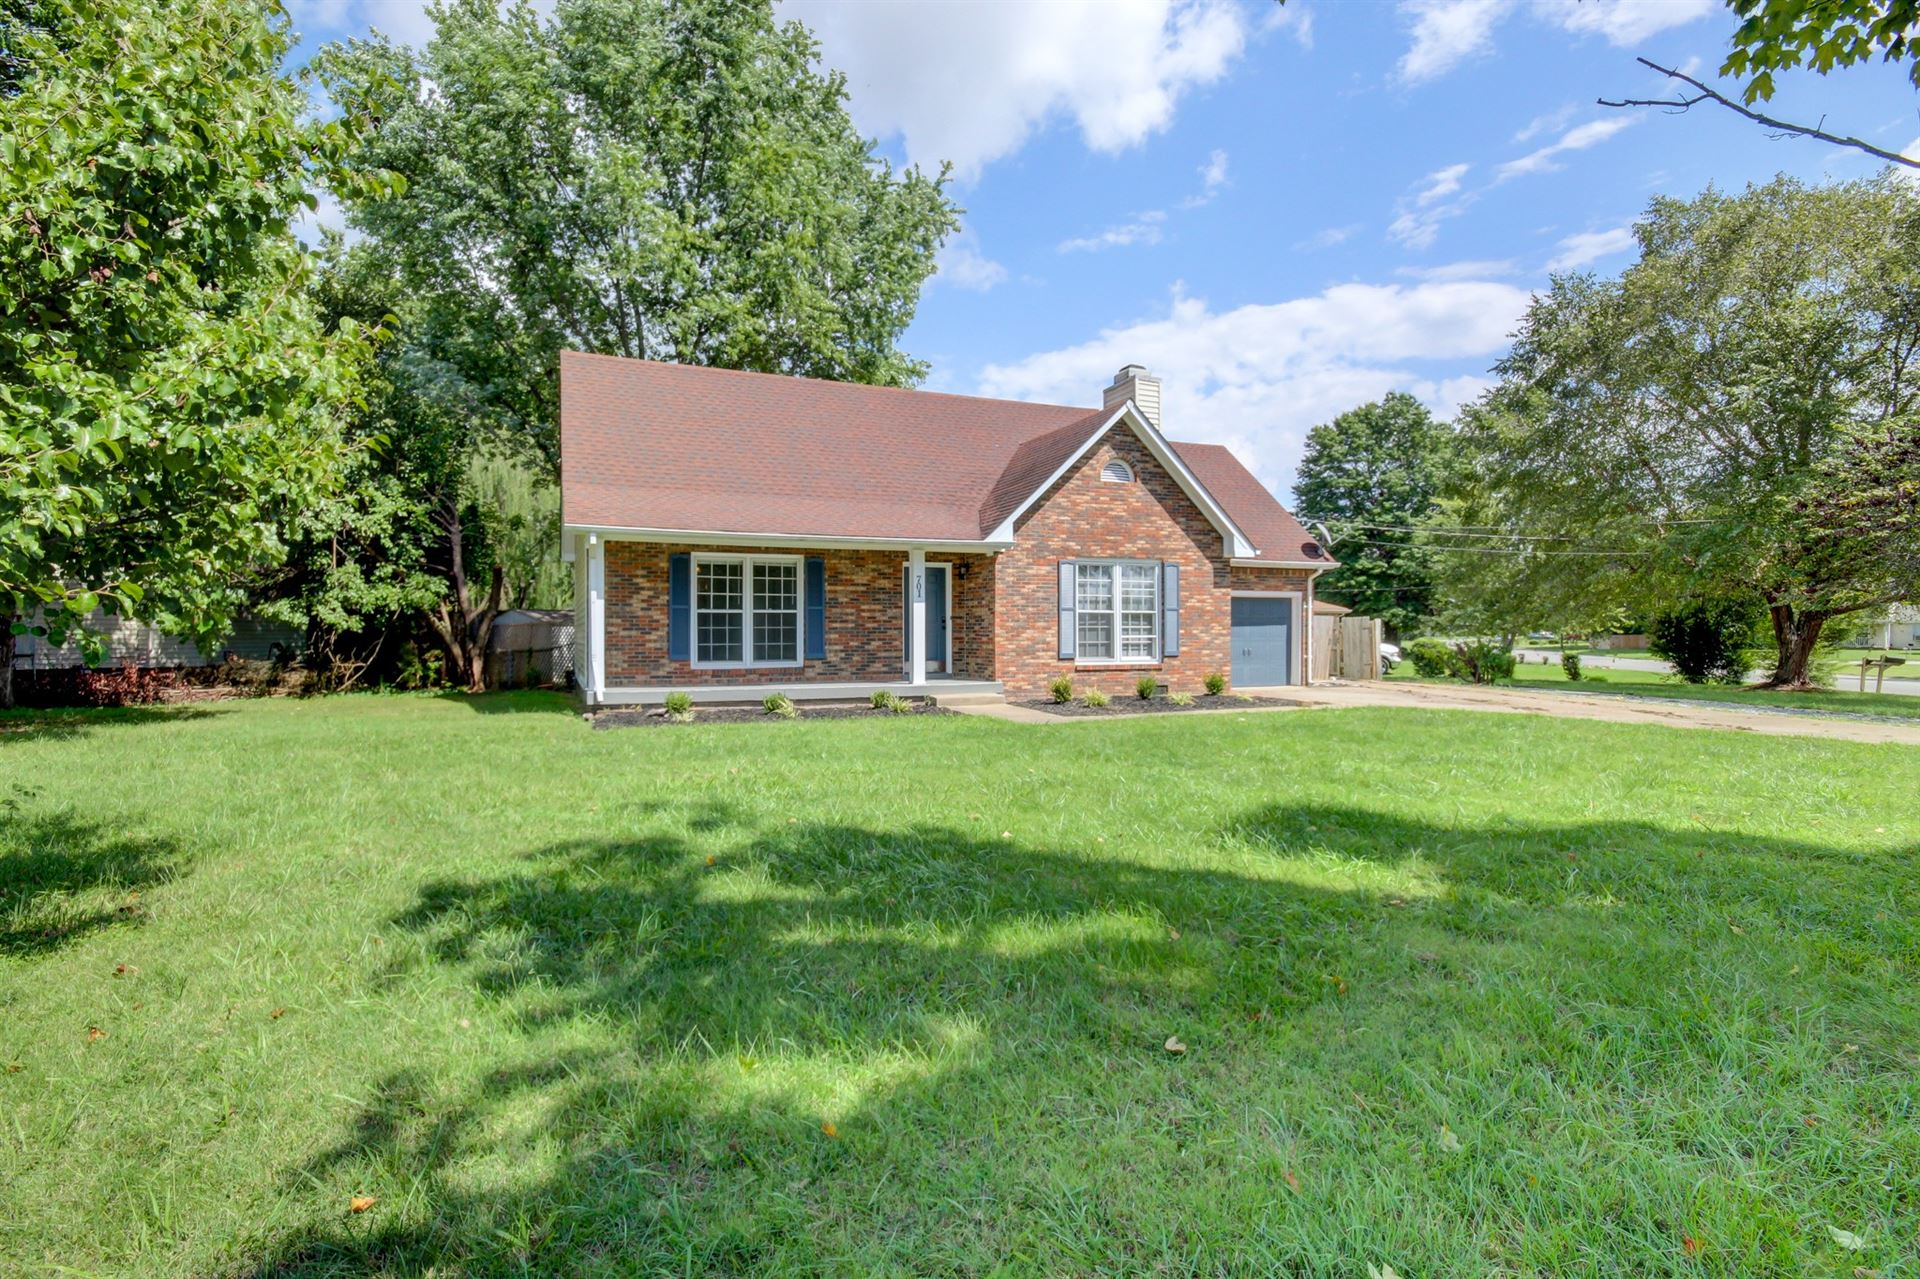 Photo of 701 Pembrook Pl, Clarksville, TN 37042 (MLS # 2292288)